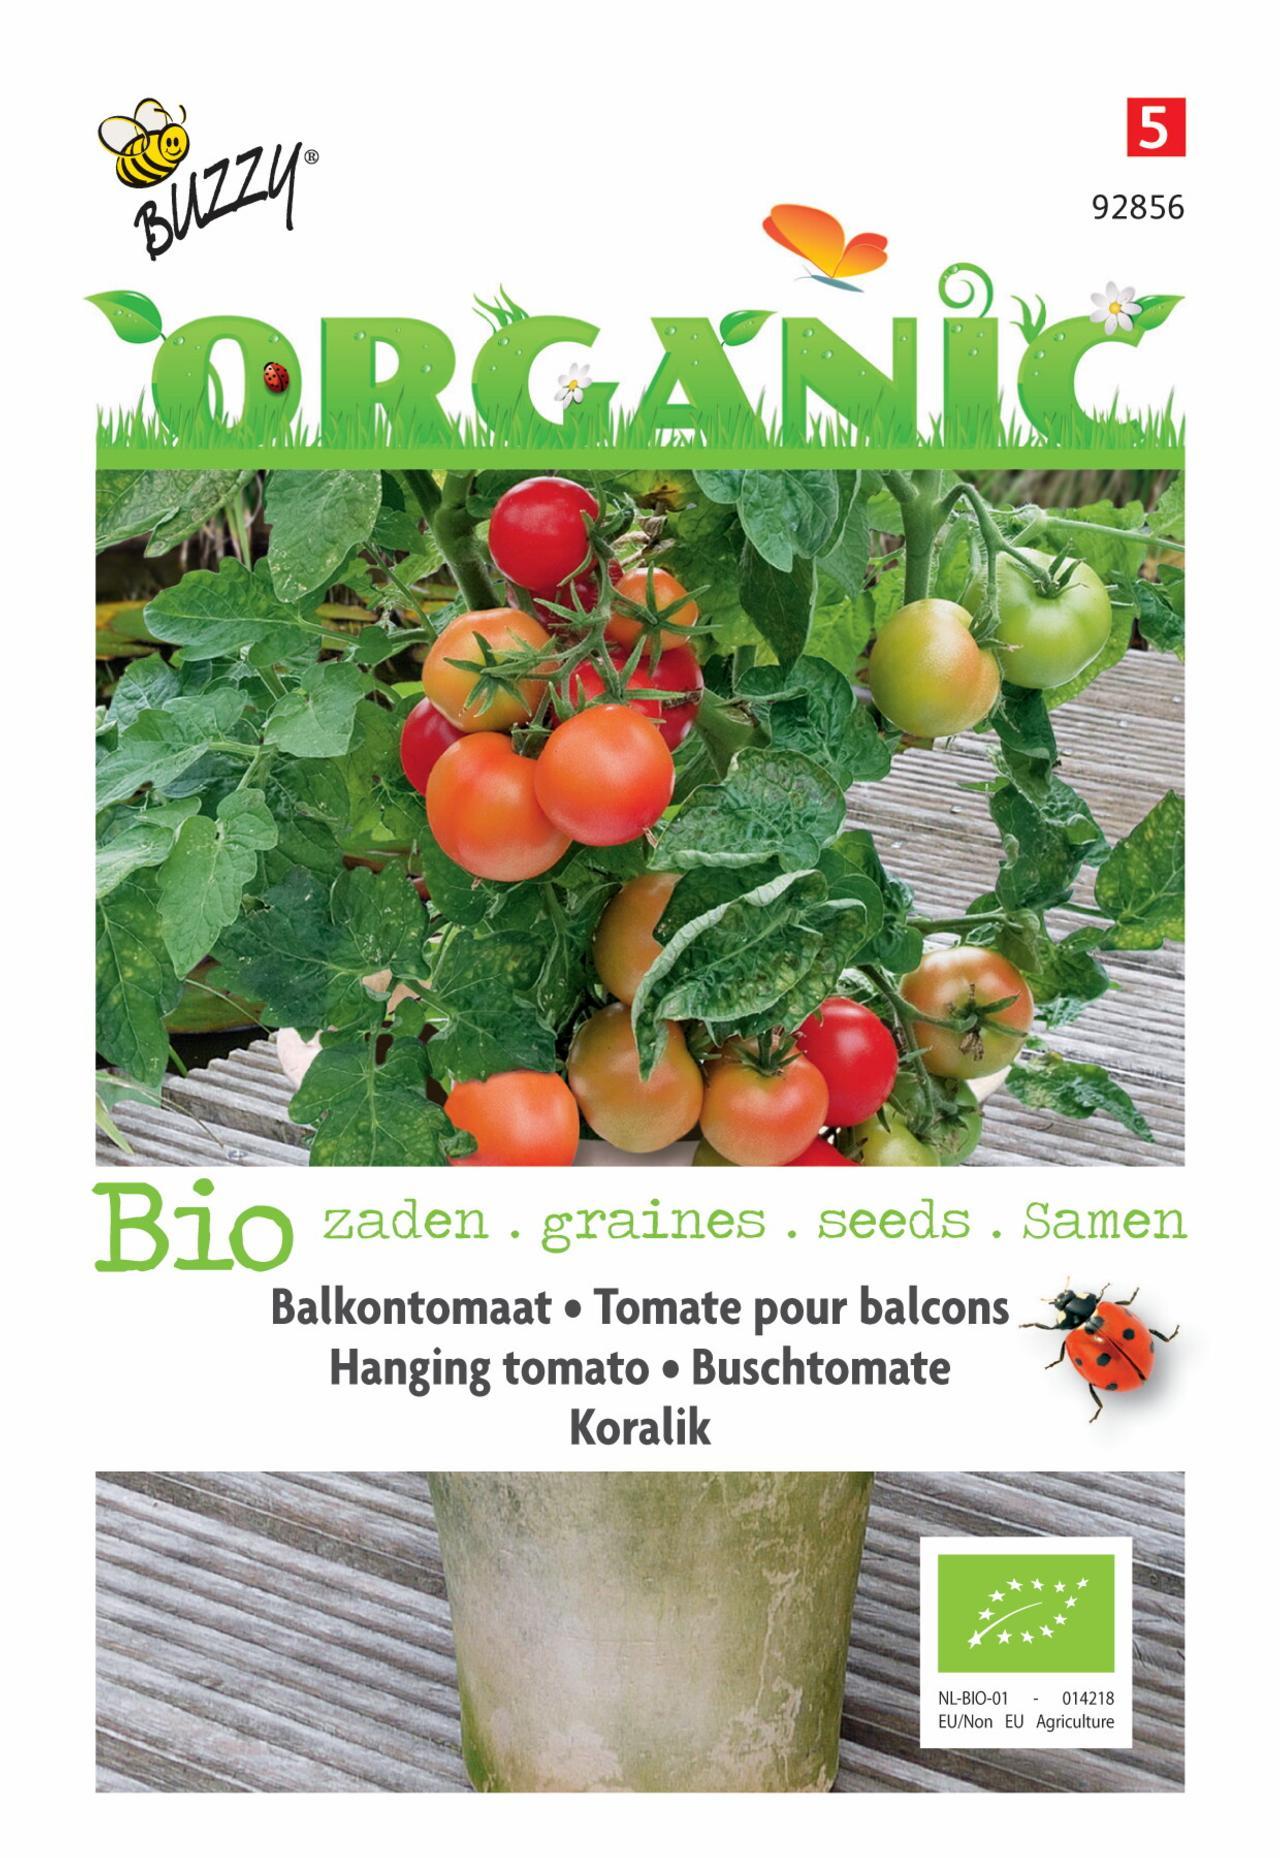 Solanum lycopersicum 'Koralik' (BIO) plant